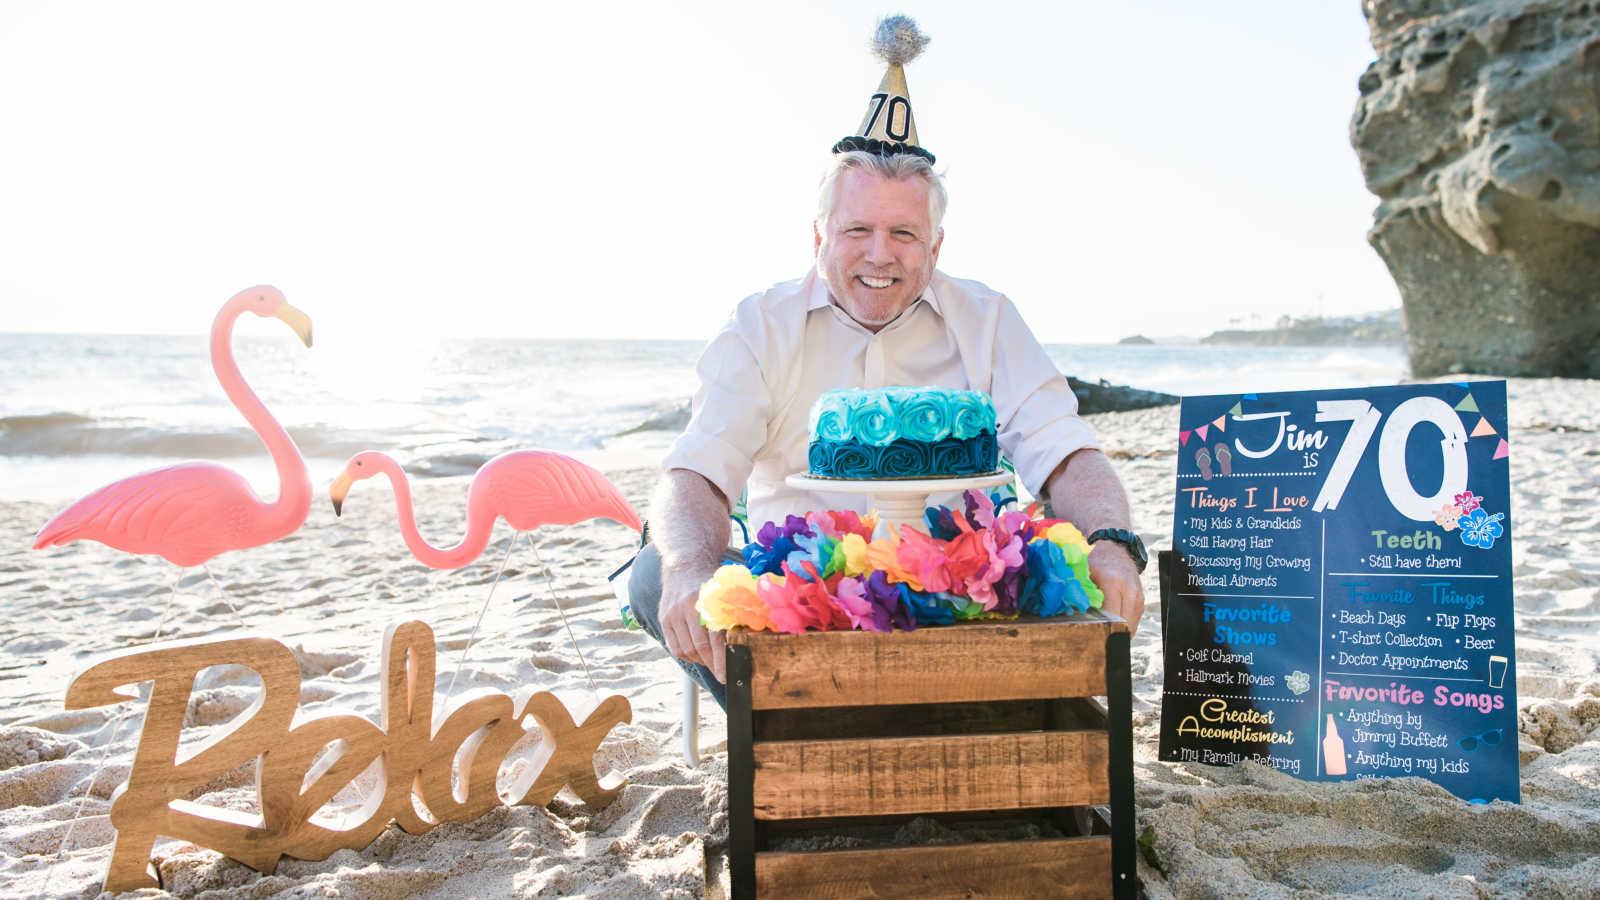 Dad celebrates 70th birthday with epic Jimmy Buffett-themed